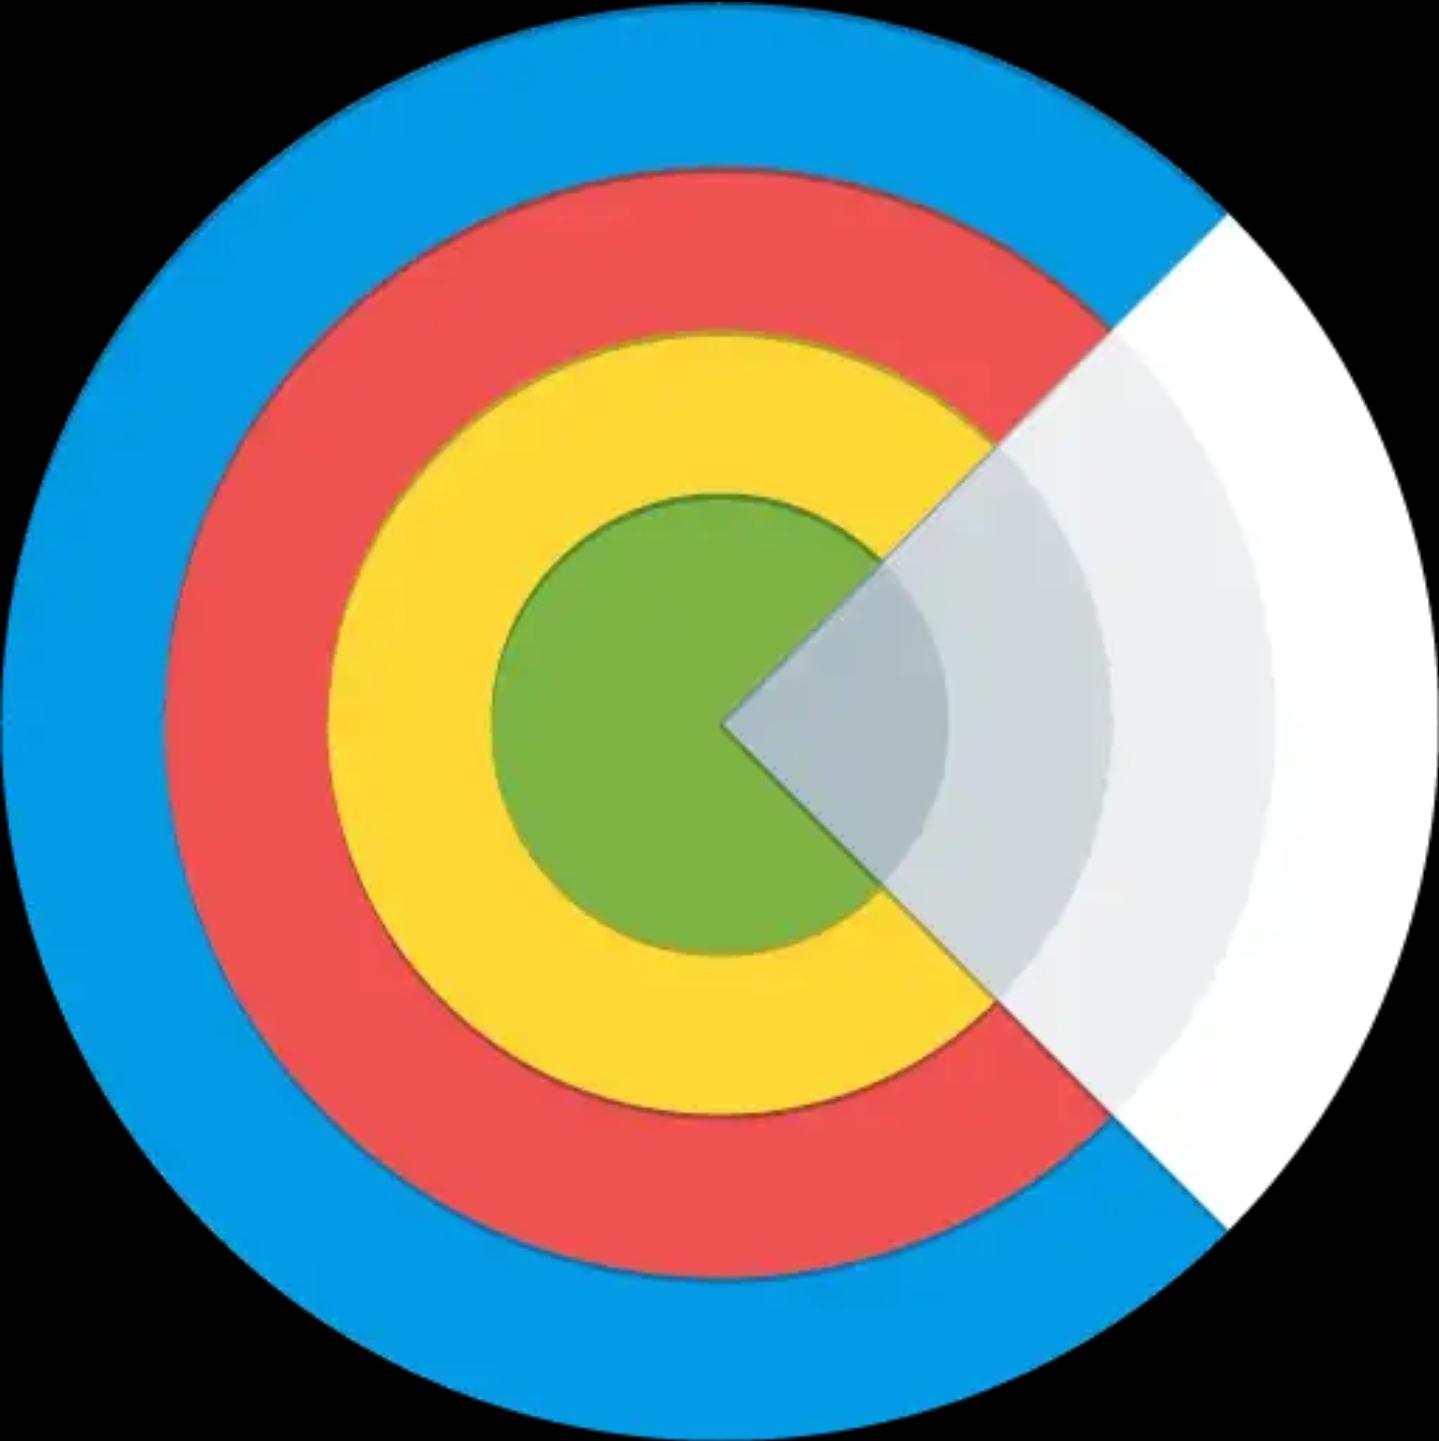 Circlet Icon Pack - Google PlayStore